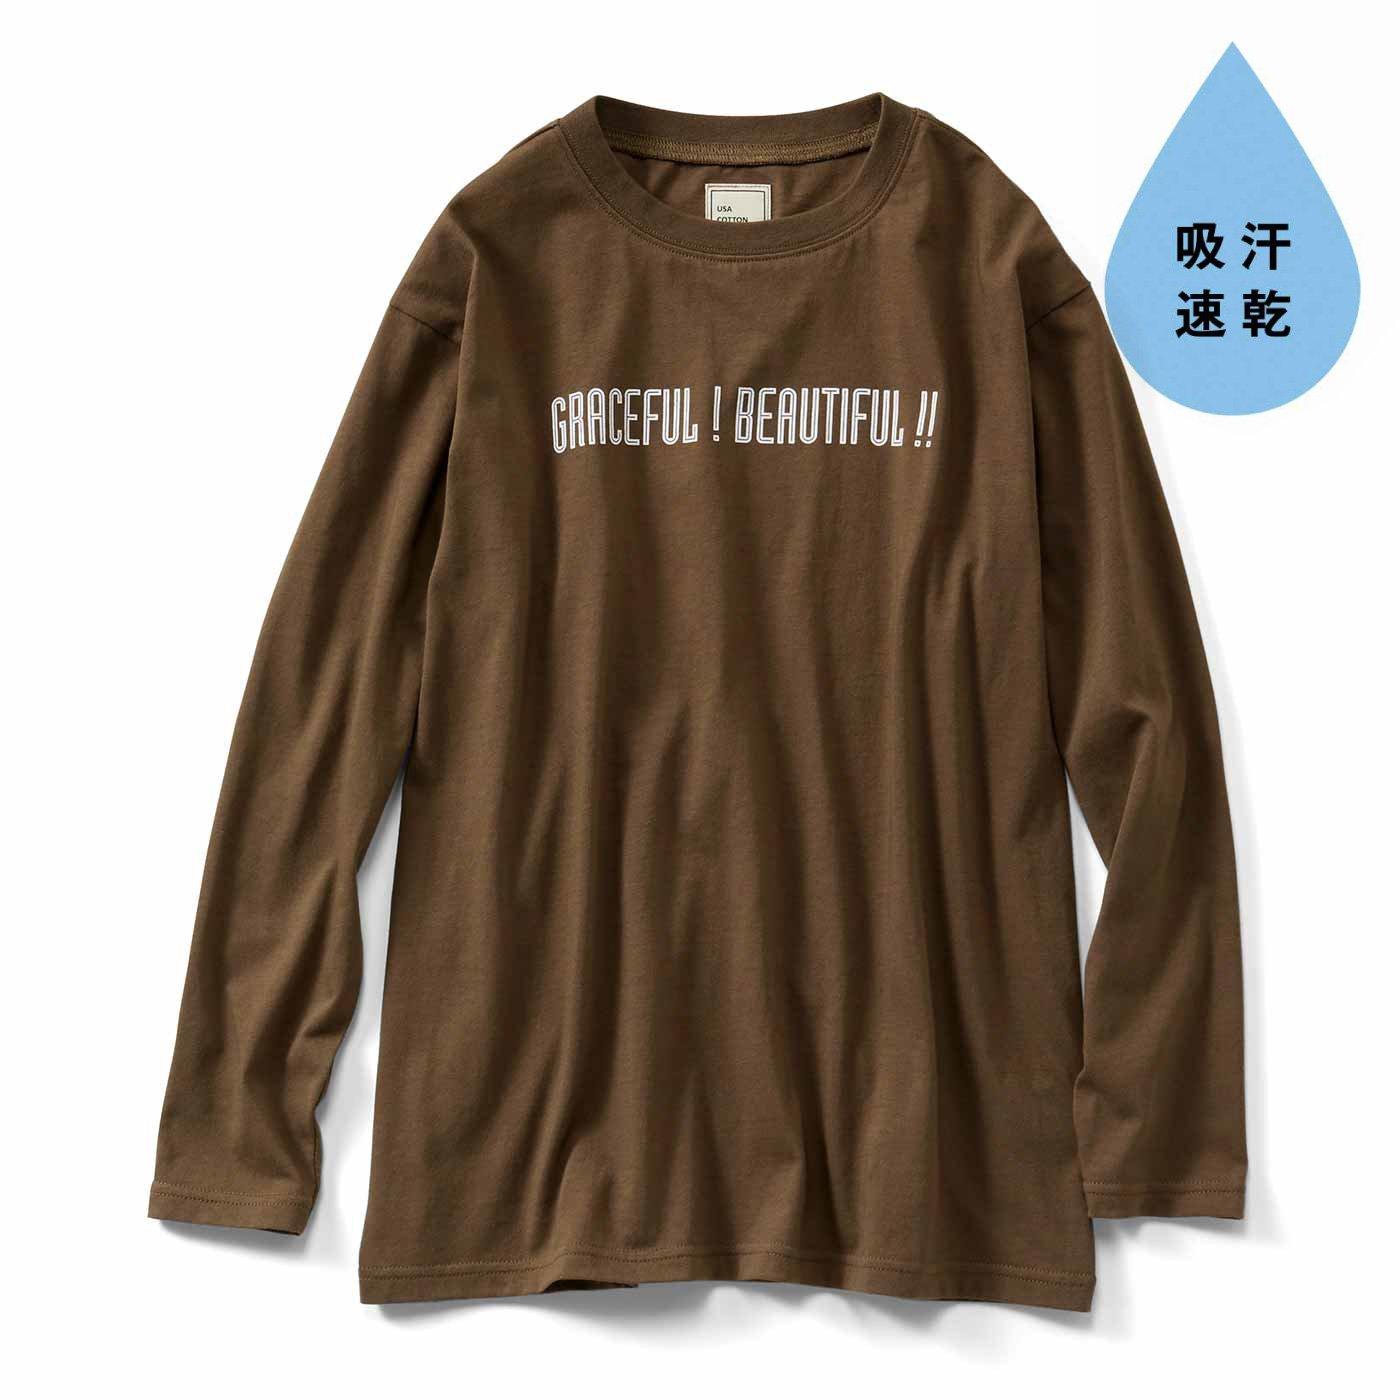 IEDIT[イディット] USAコットンの大人ロゴTシャツ〈カーキブラウン〉